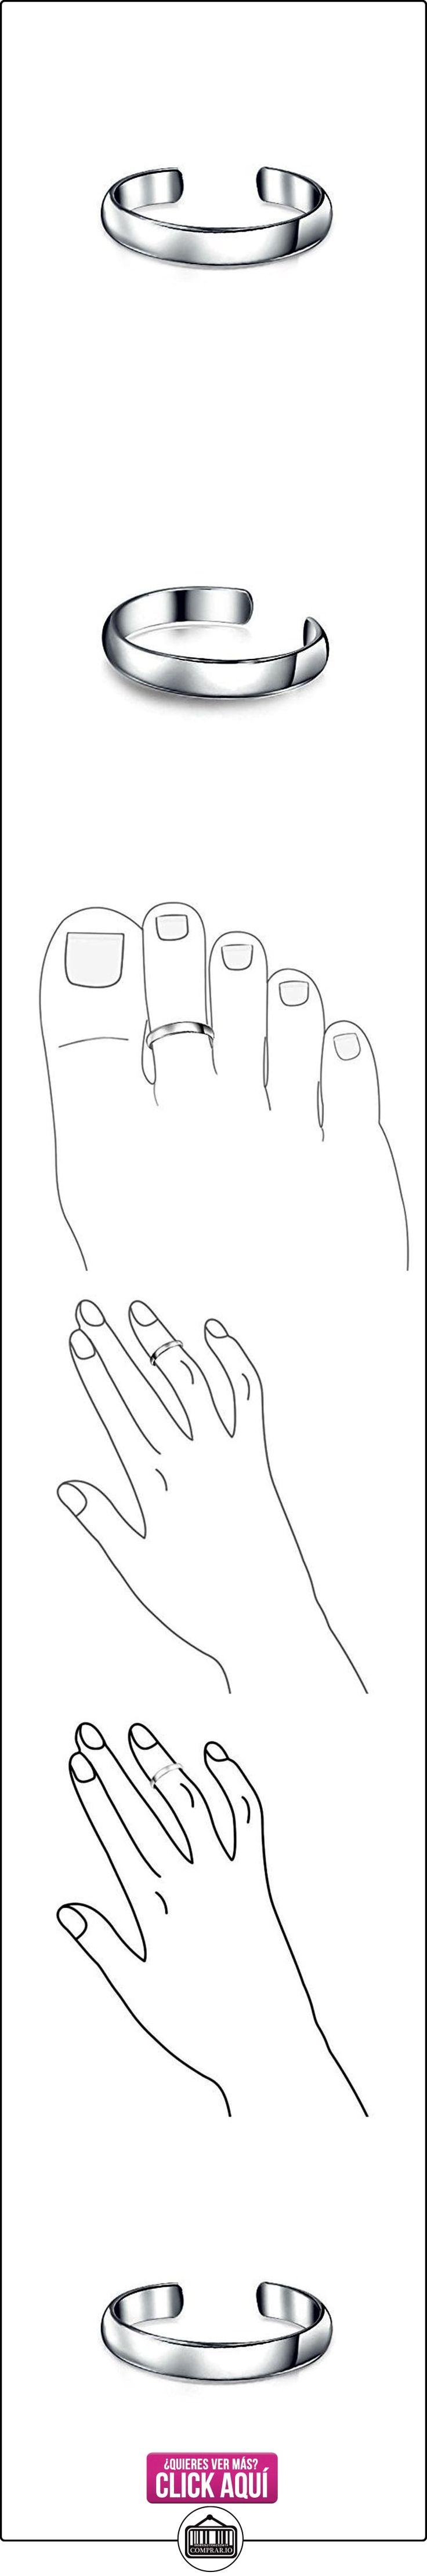 Bling Jewelry Plata Esterlina Clásica Anillo ajutable Anillo del dedo Anillo Midi  ✿ Joyas para mujer - Las mejores ofertas ✿ ▬► Ver oferta: http://comprar.io/goto/B00E1PVD5Q